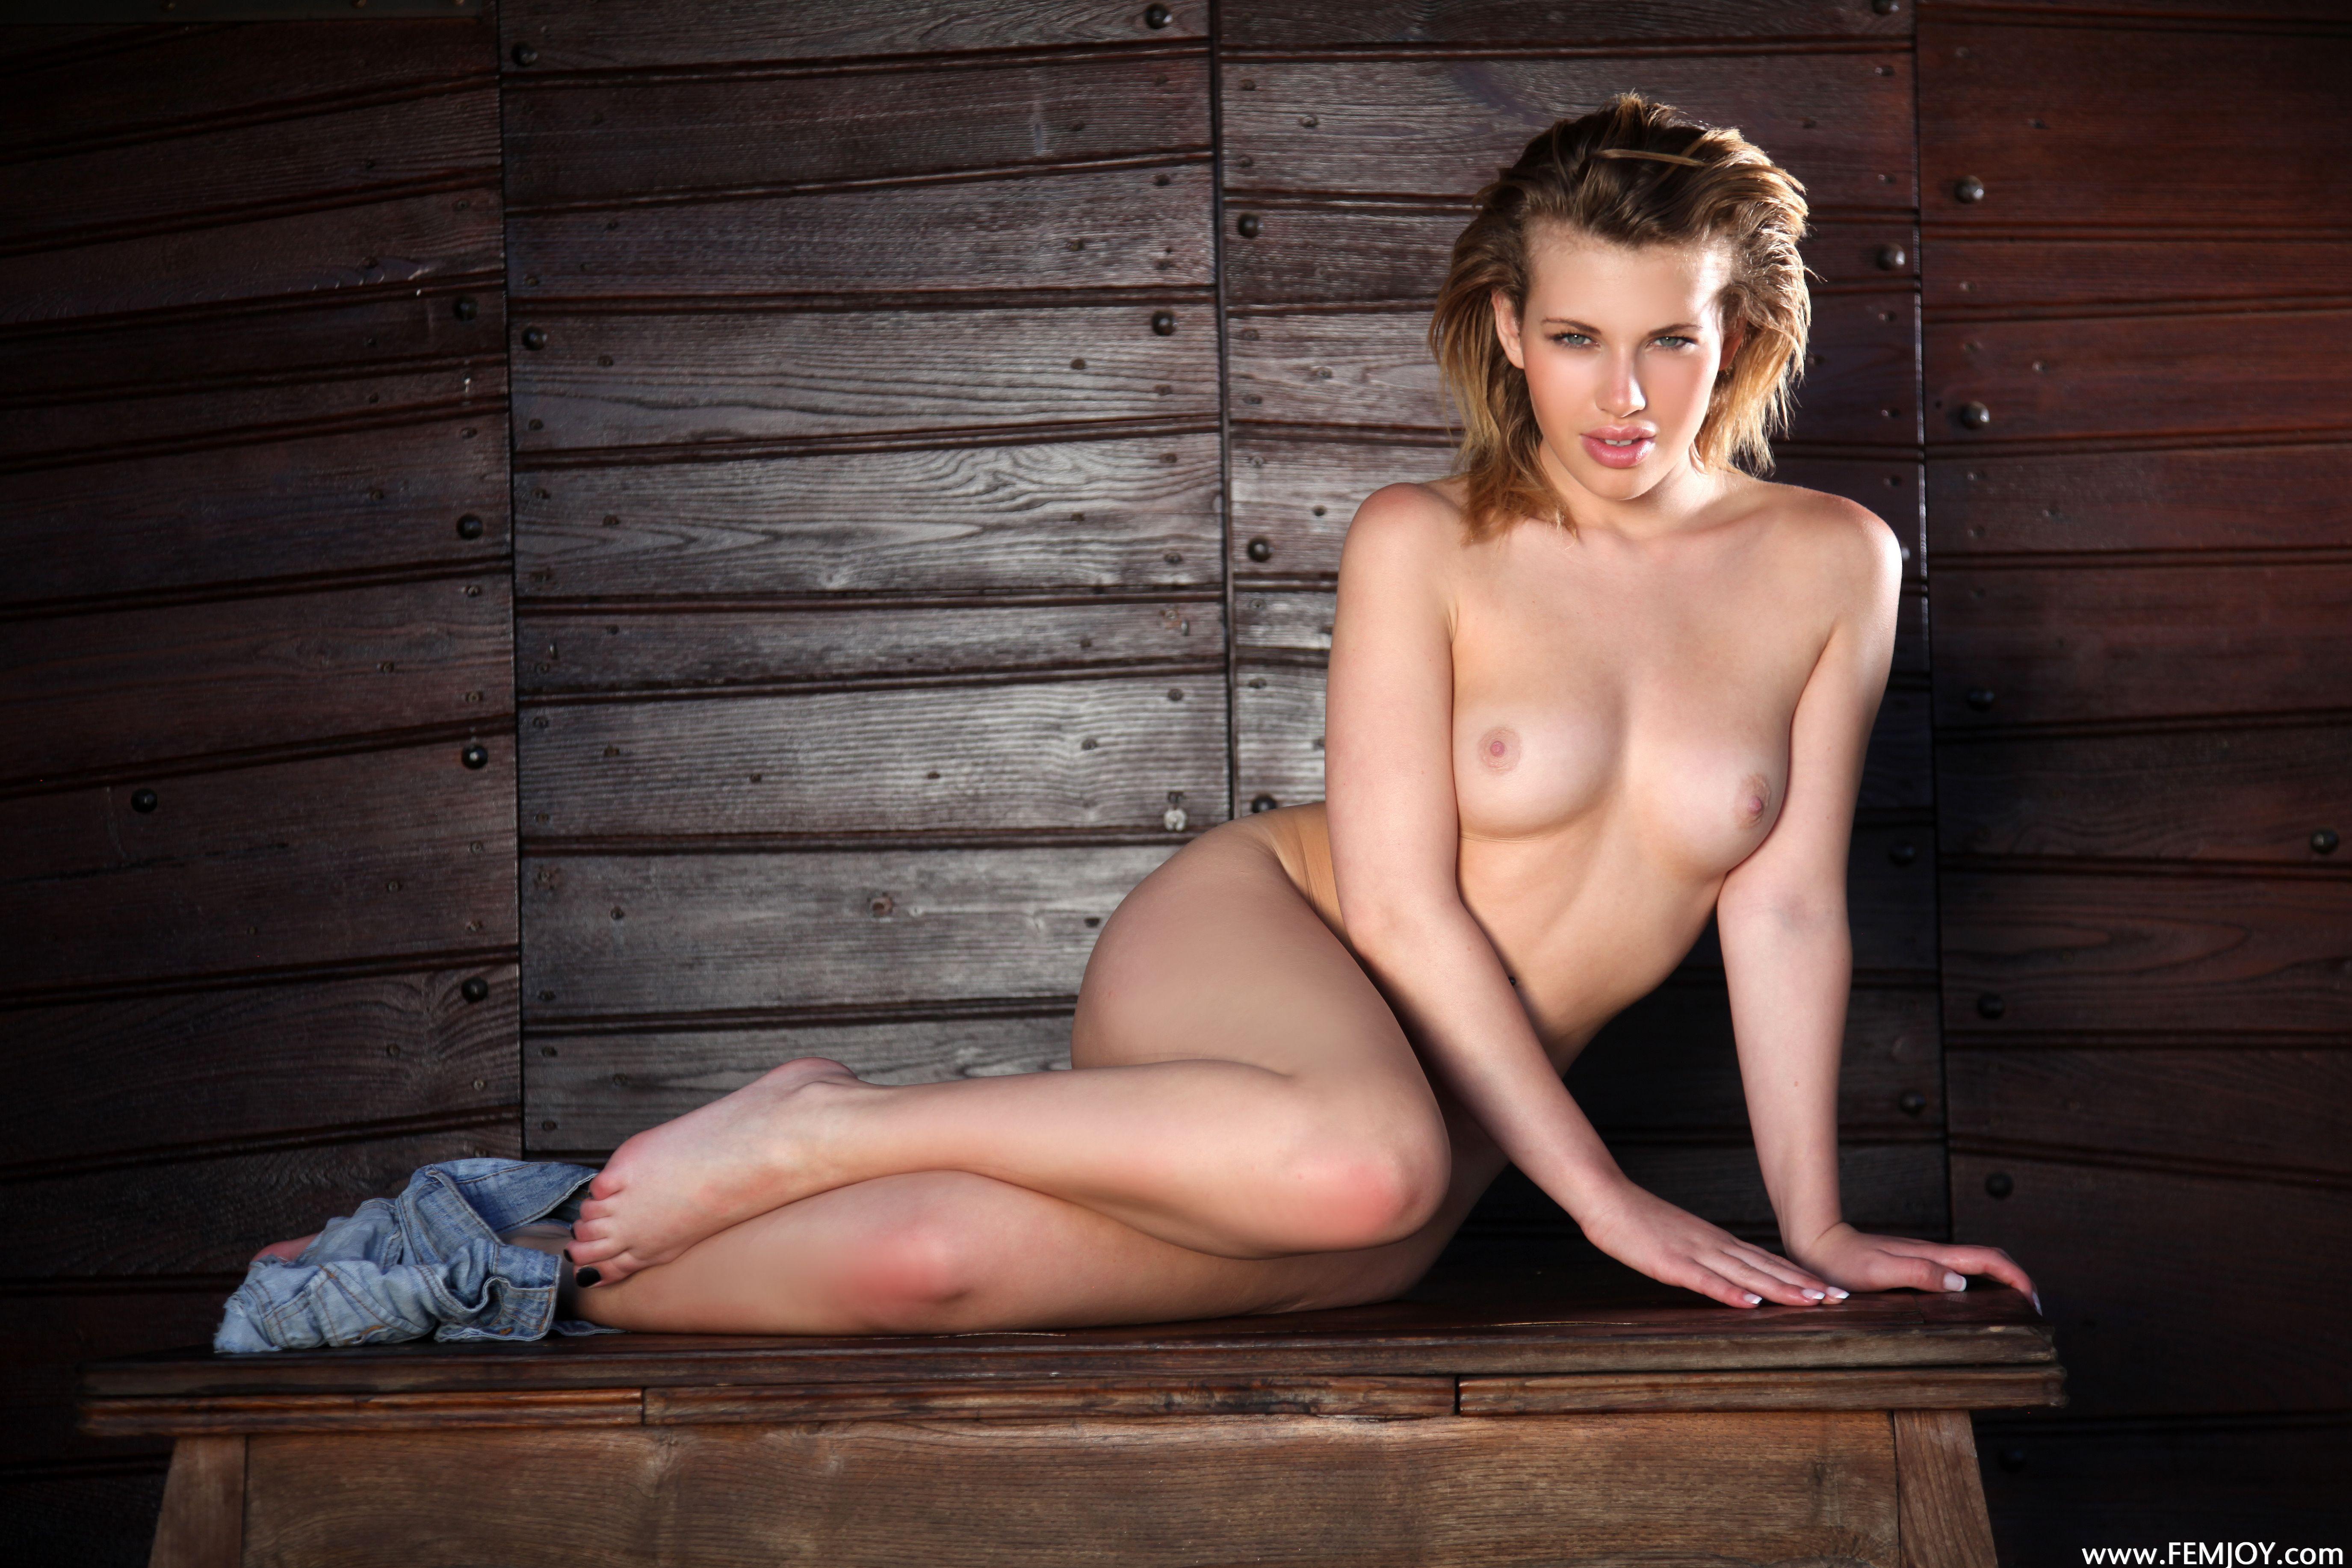 http://i6.imageban.ru/out/2013/11/13/2f0752367254b9dcc4be64c7c7a106e5.jpg